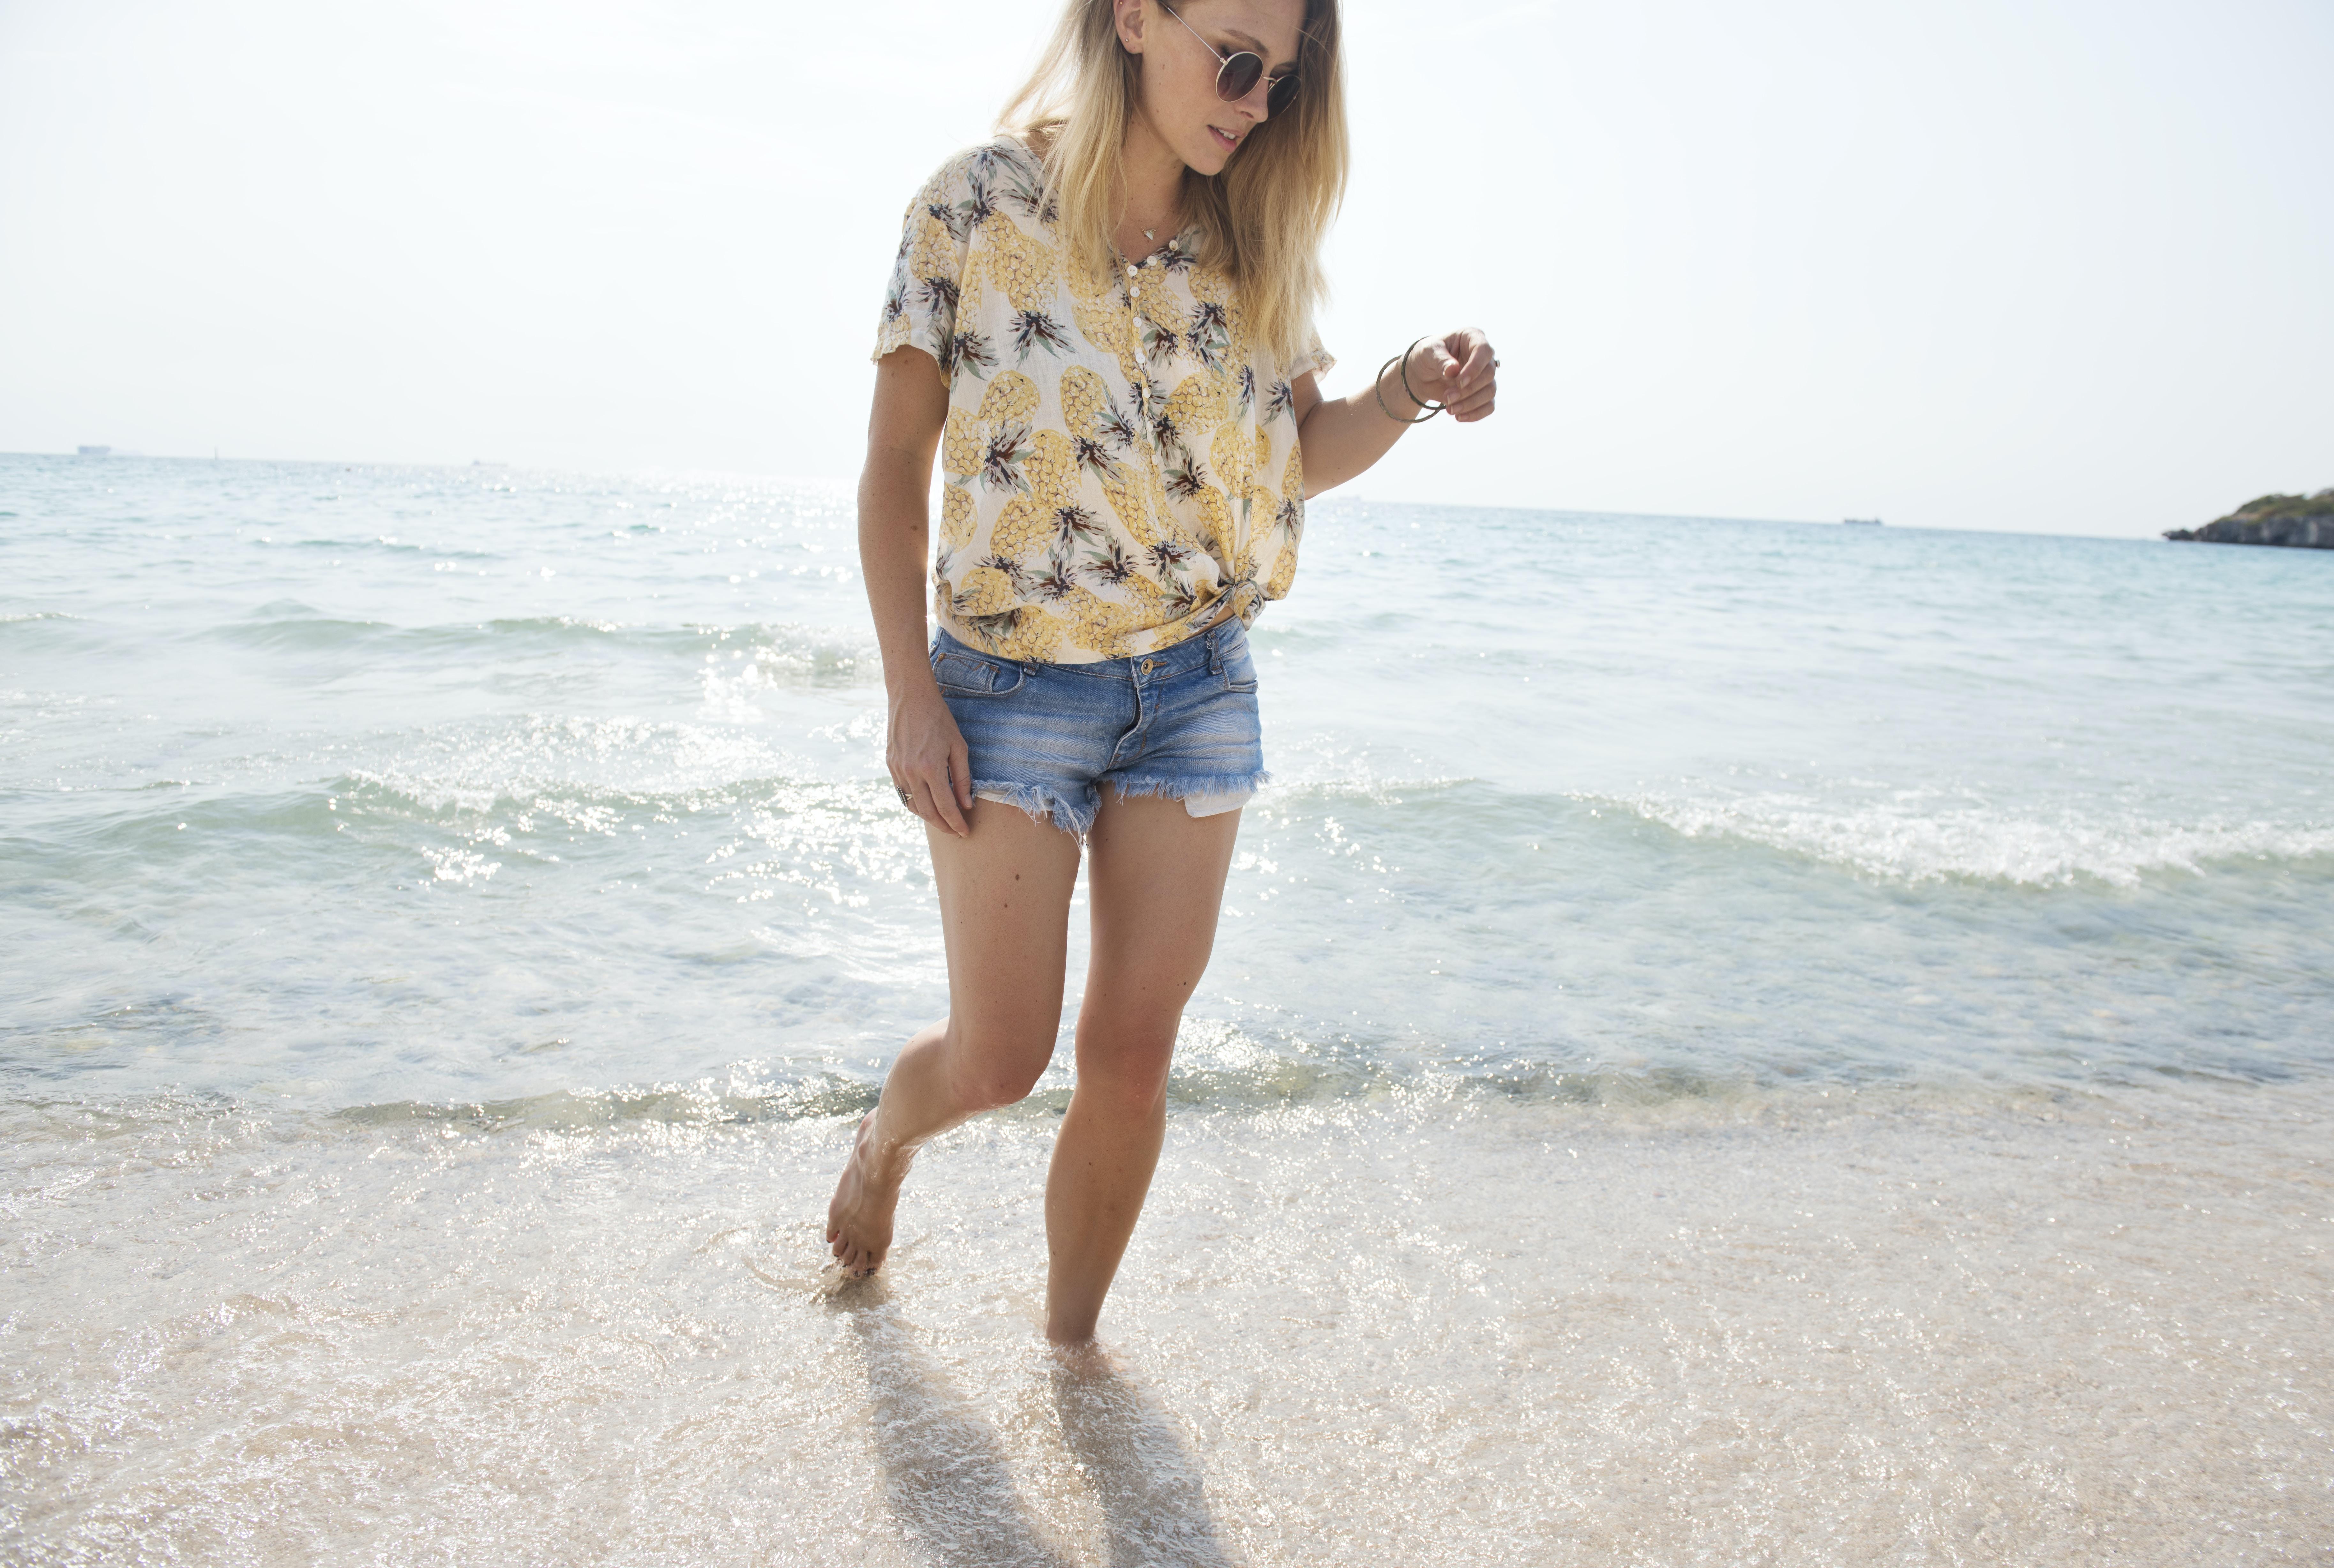 woman walking on seashore with sea waves